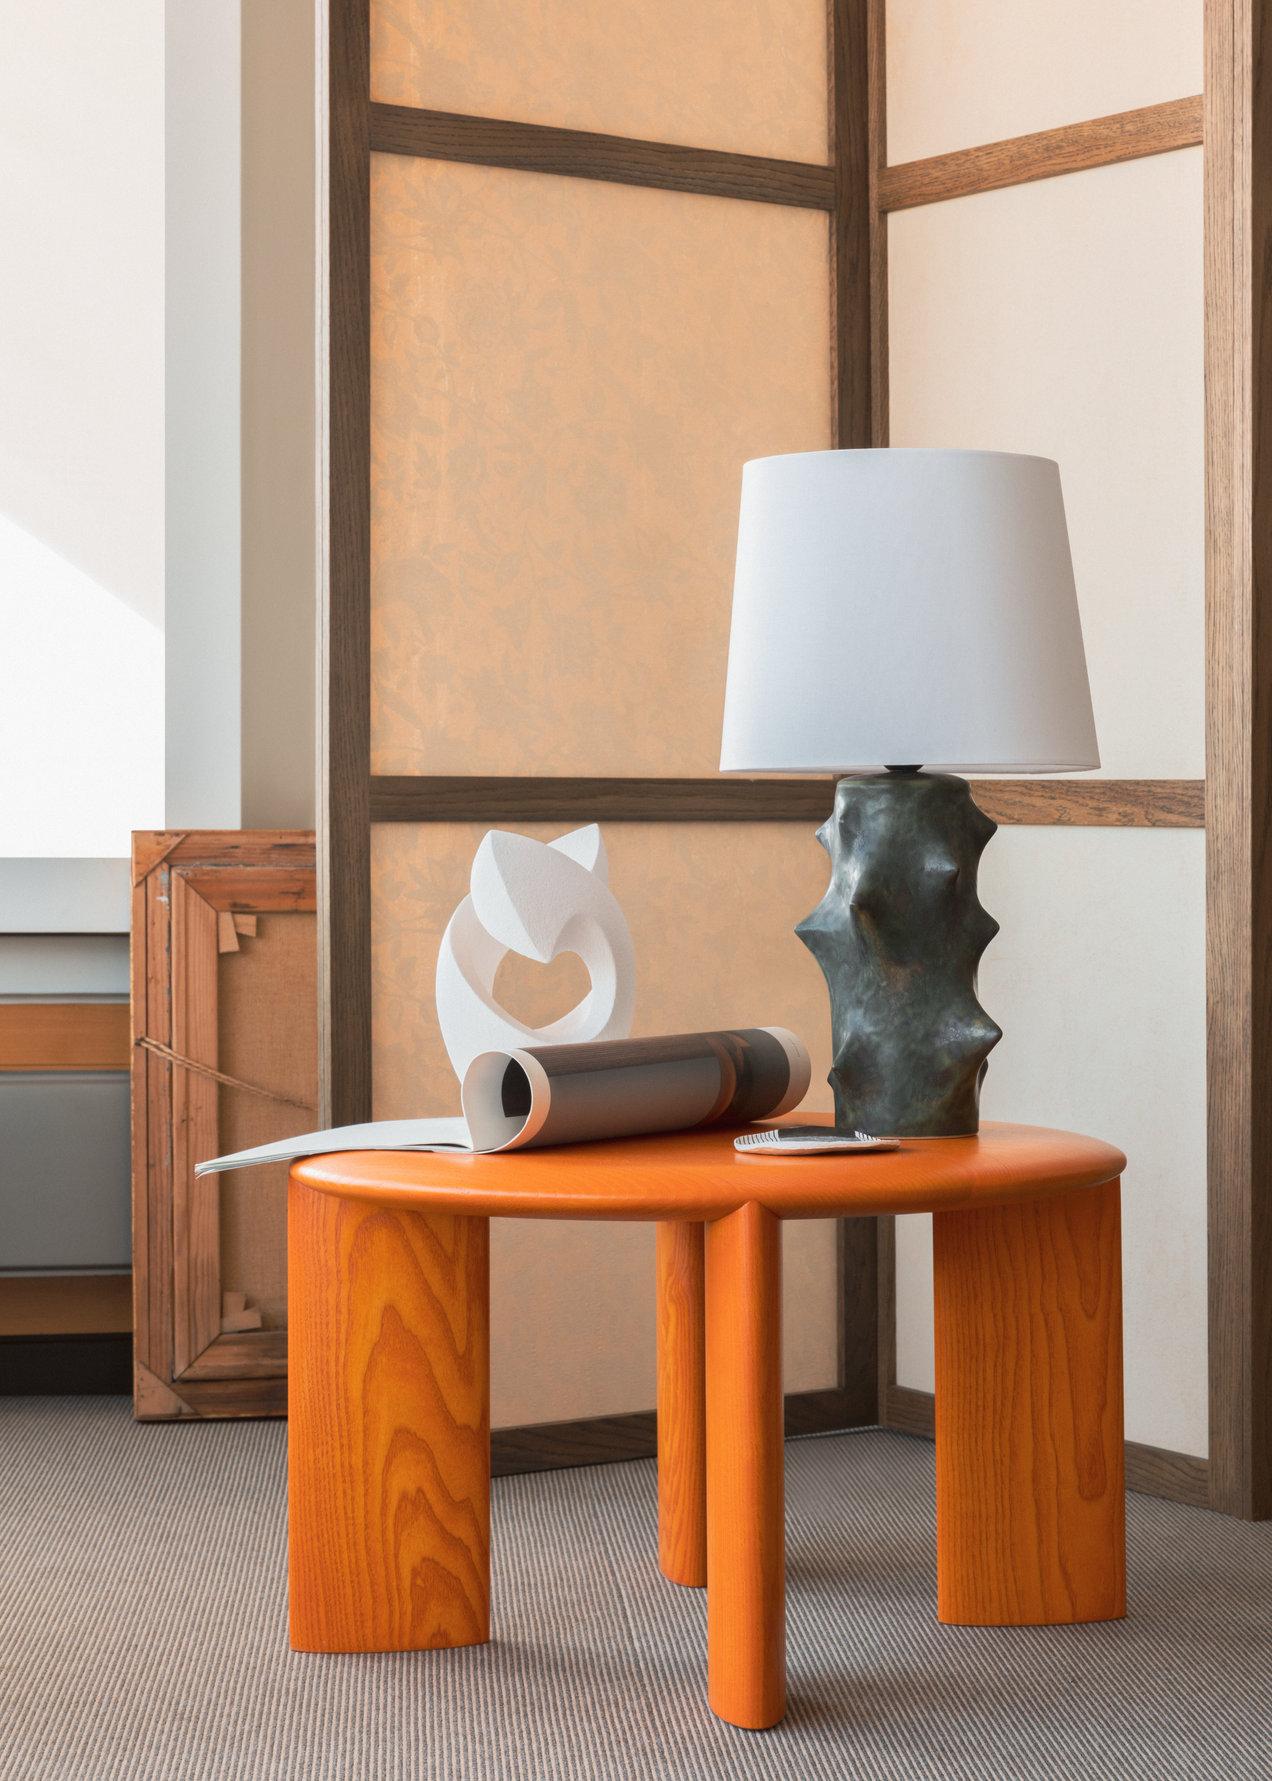 IO--3694-3695--long-table--gallerySlider-1--Ash-OE.png